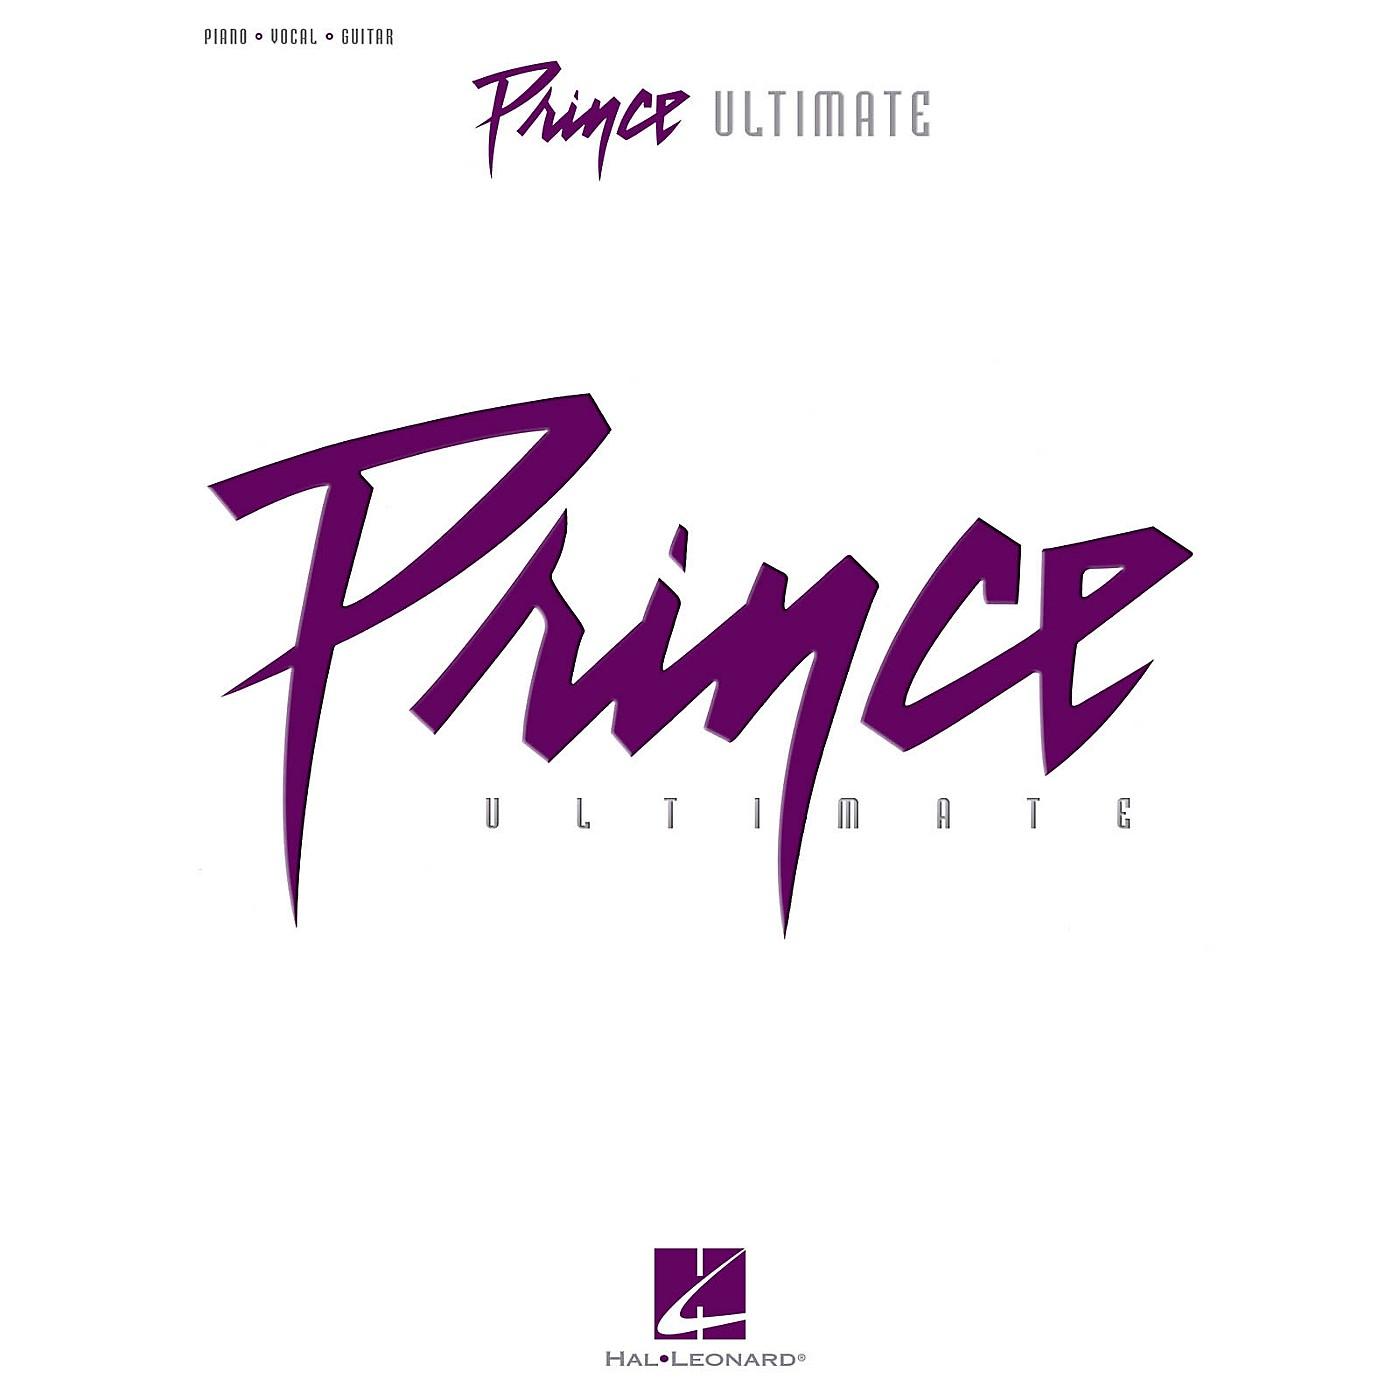 Hal Leonard Prince-Ultimate Piano/Vocal/Guitar Songbook thumbnail